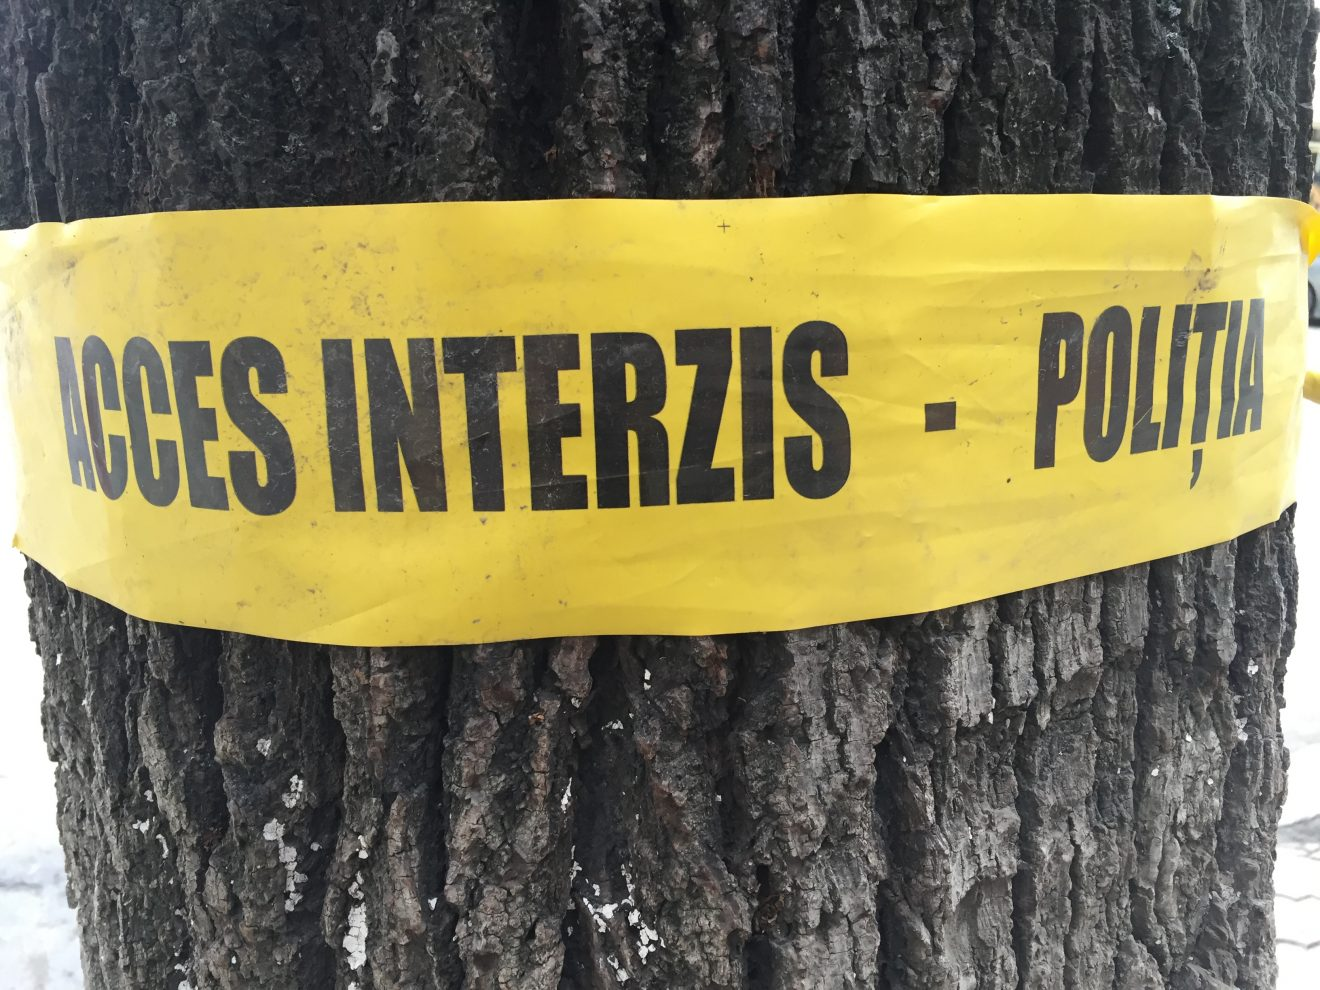 Во Флорештском районе мужчина тяпкой убил родственника